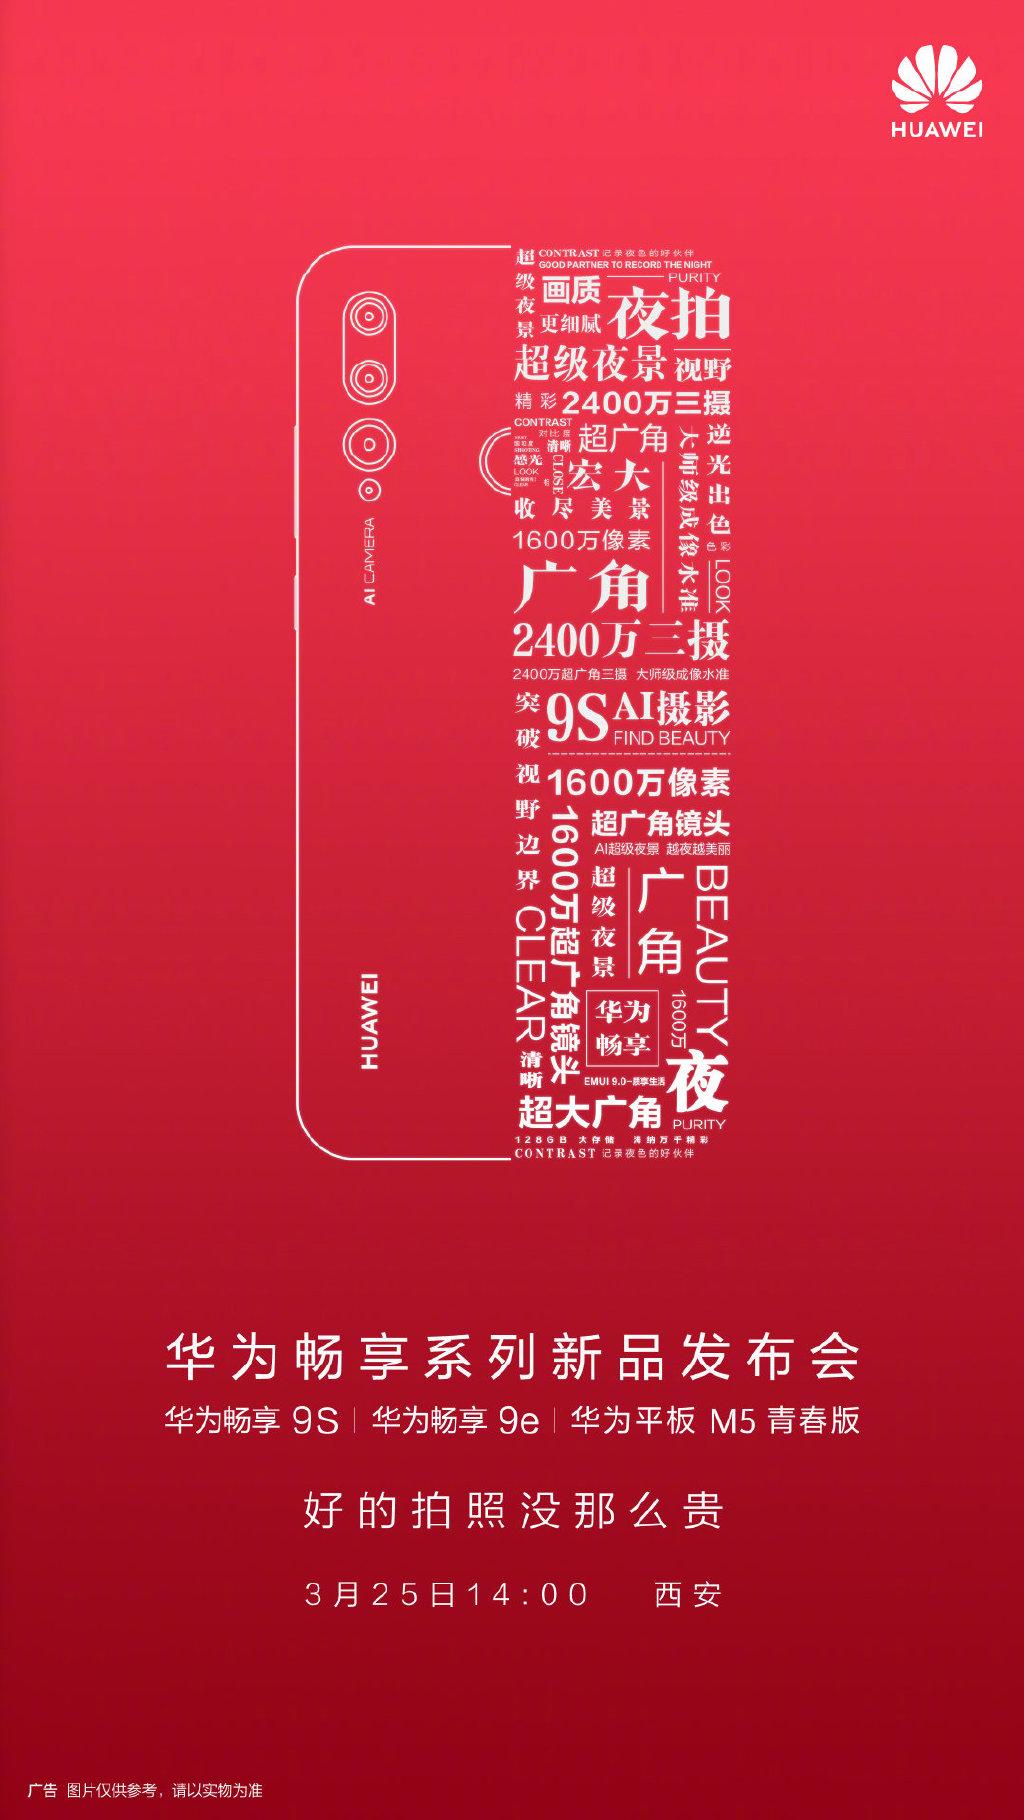 Huawei Enjoy 9S teaser